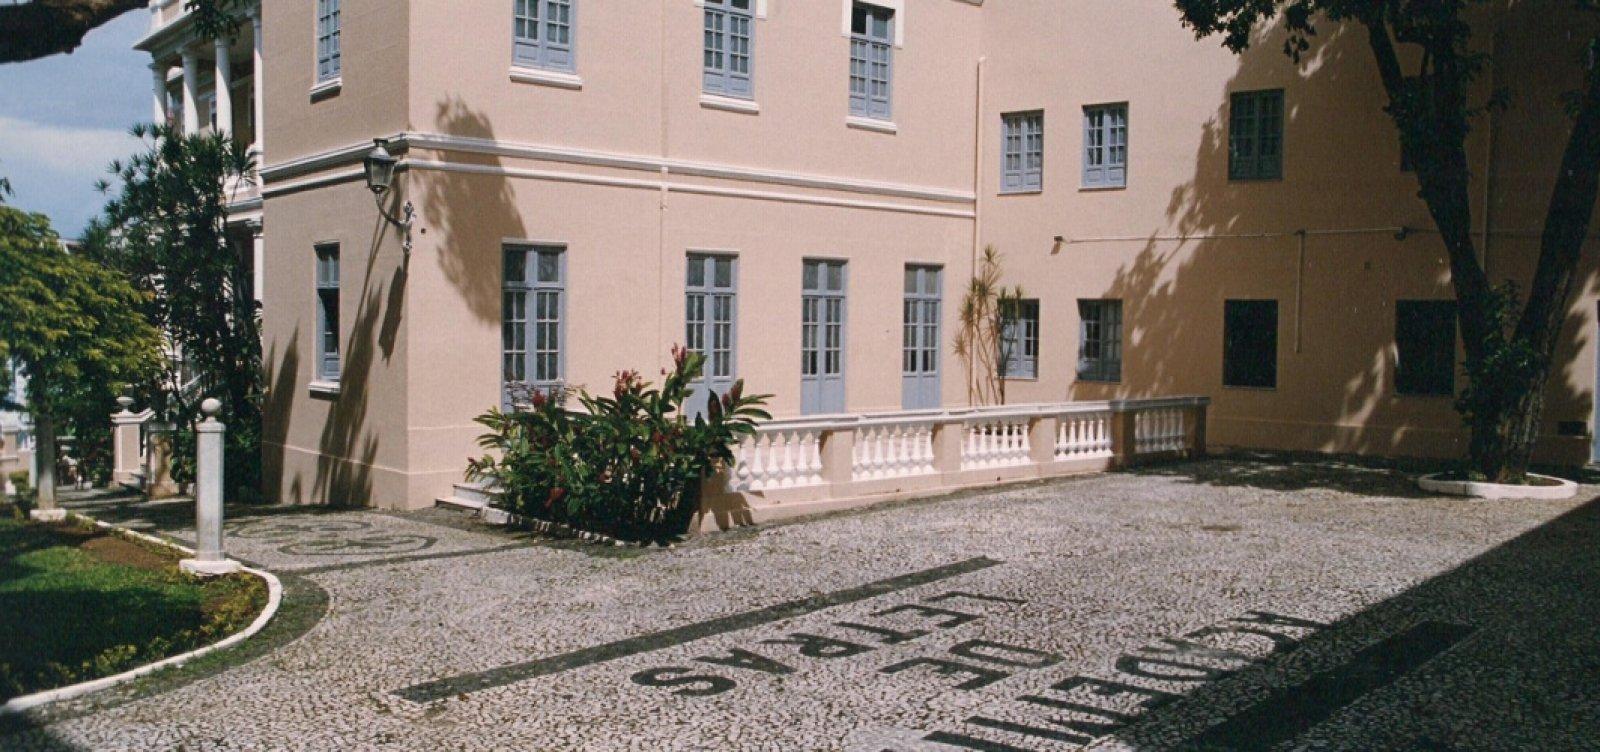 [Academia de Letras da Bahia emite carta aberta a candidatos ao governo]